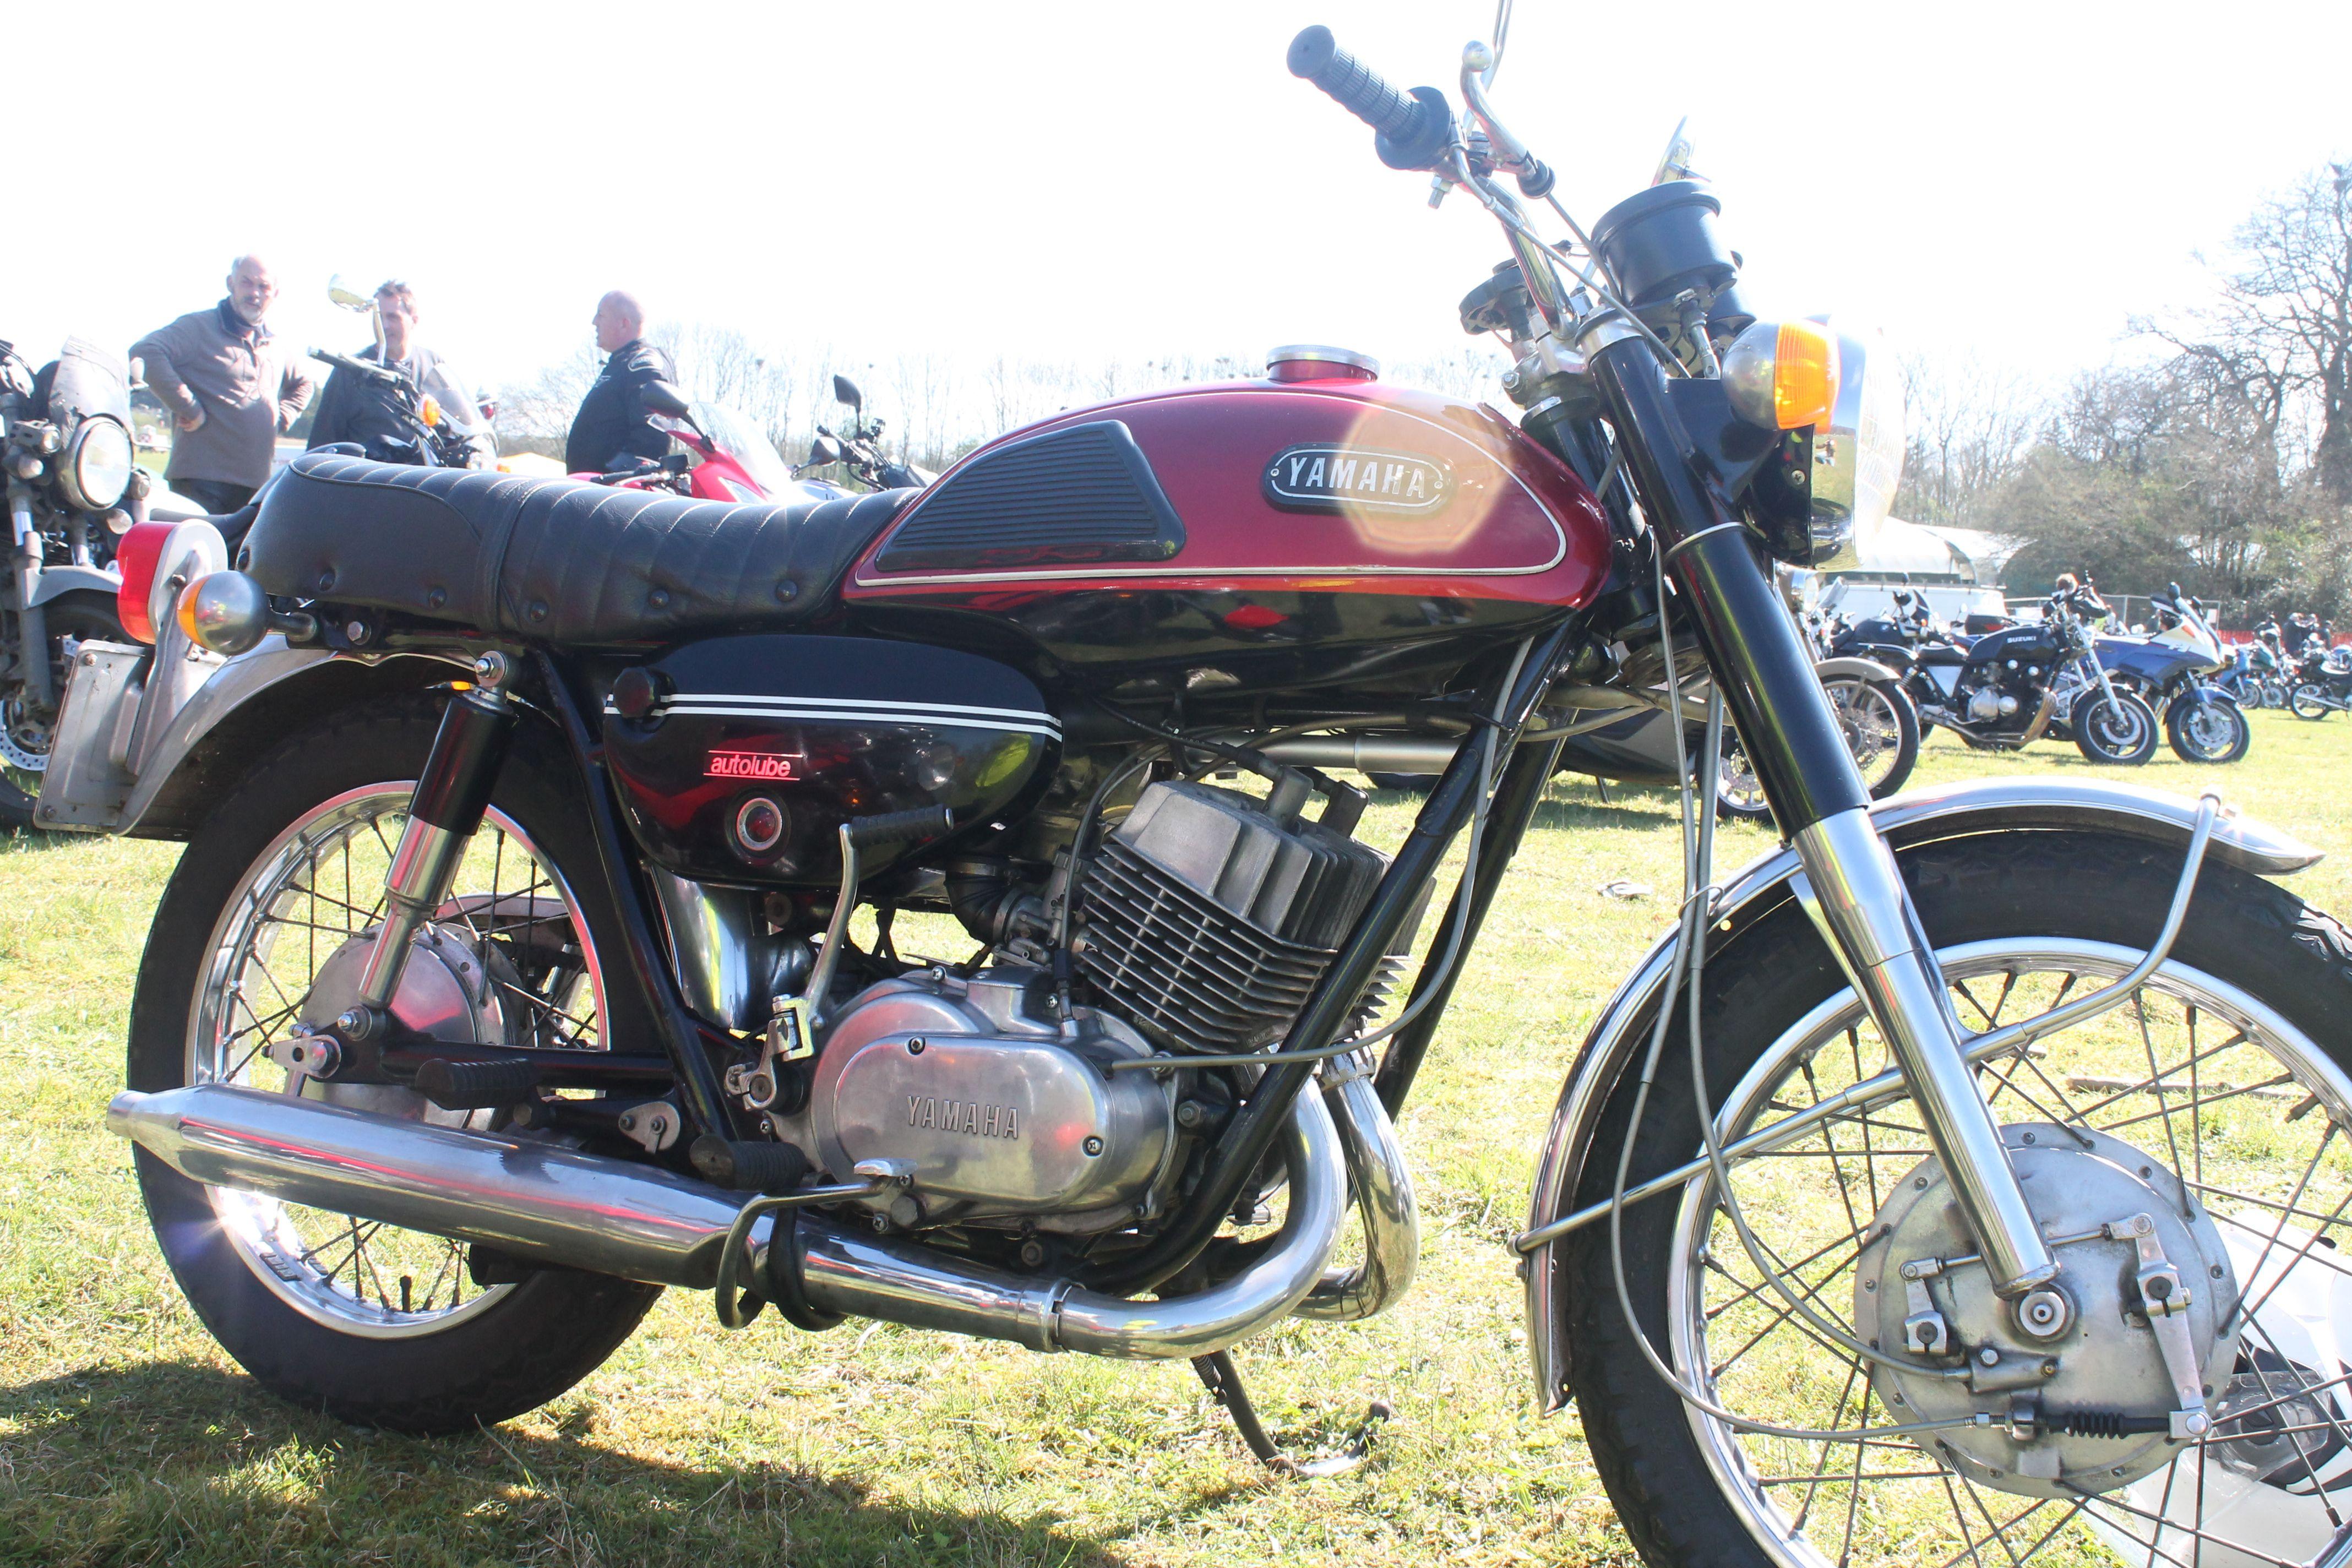 Yamaha Yr3 350cc